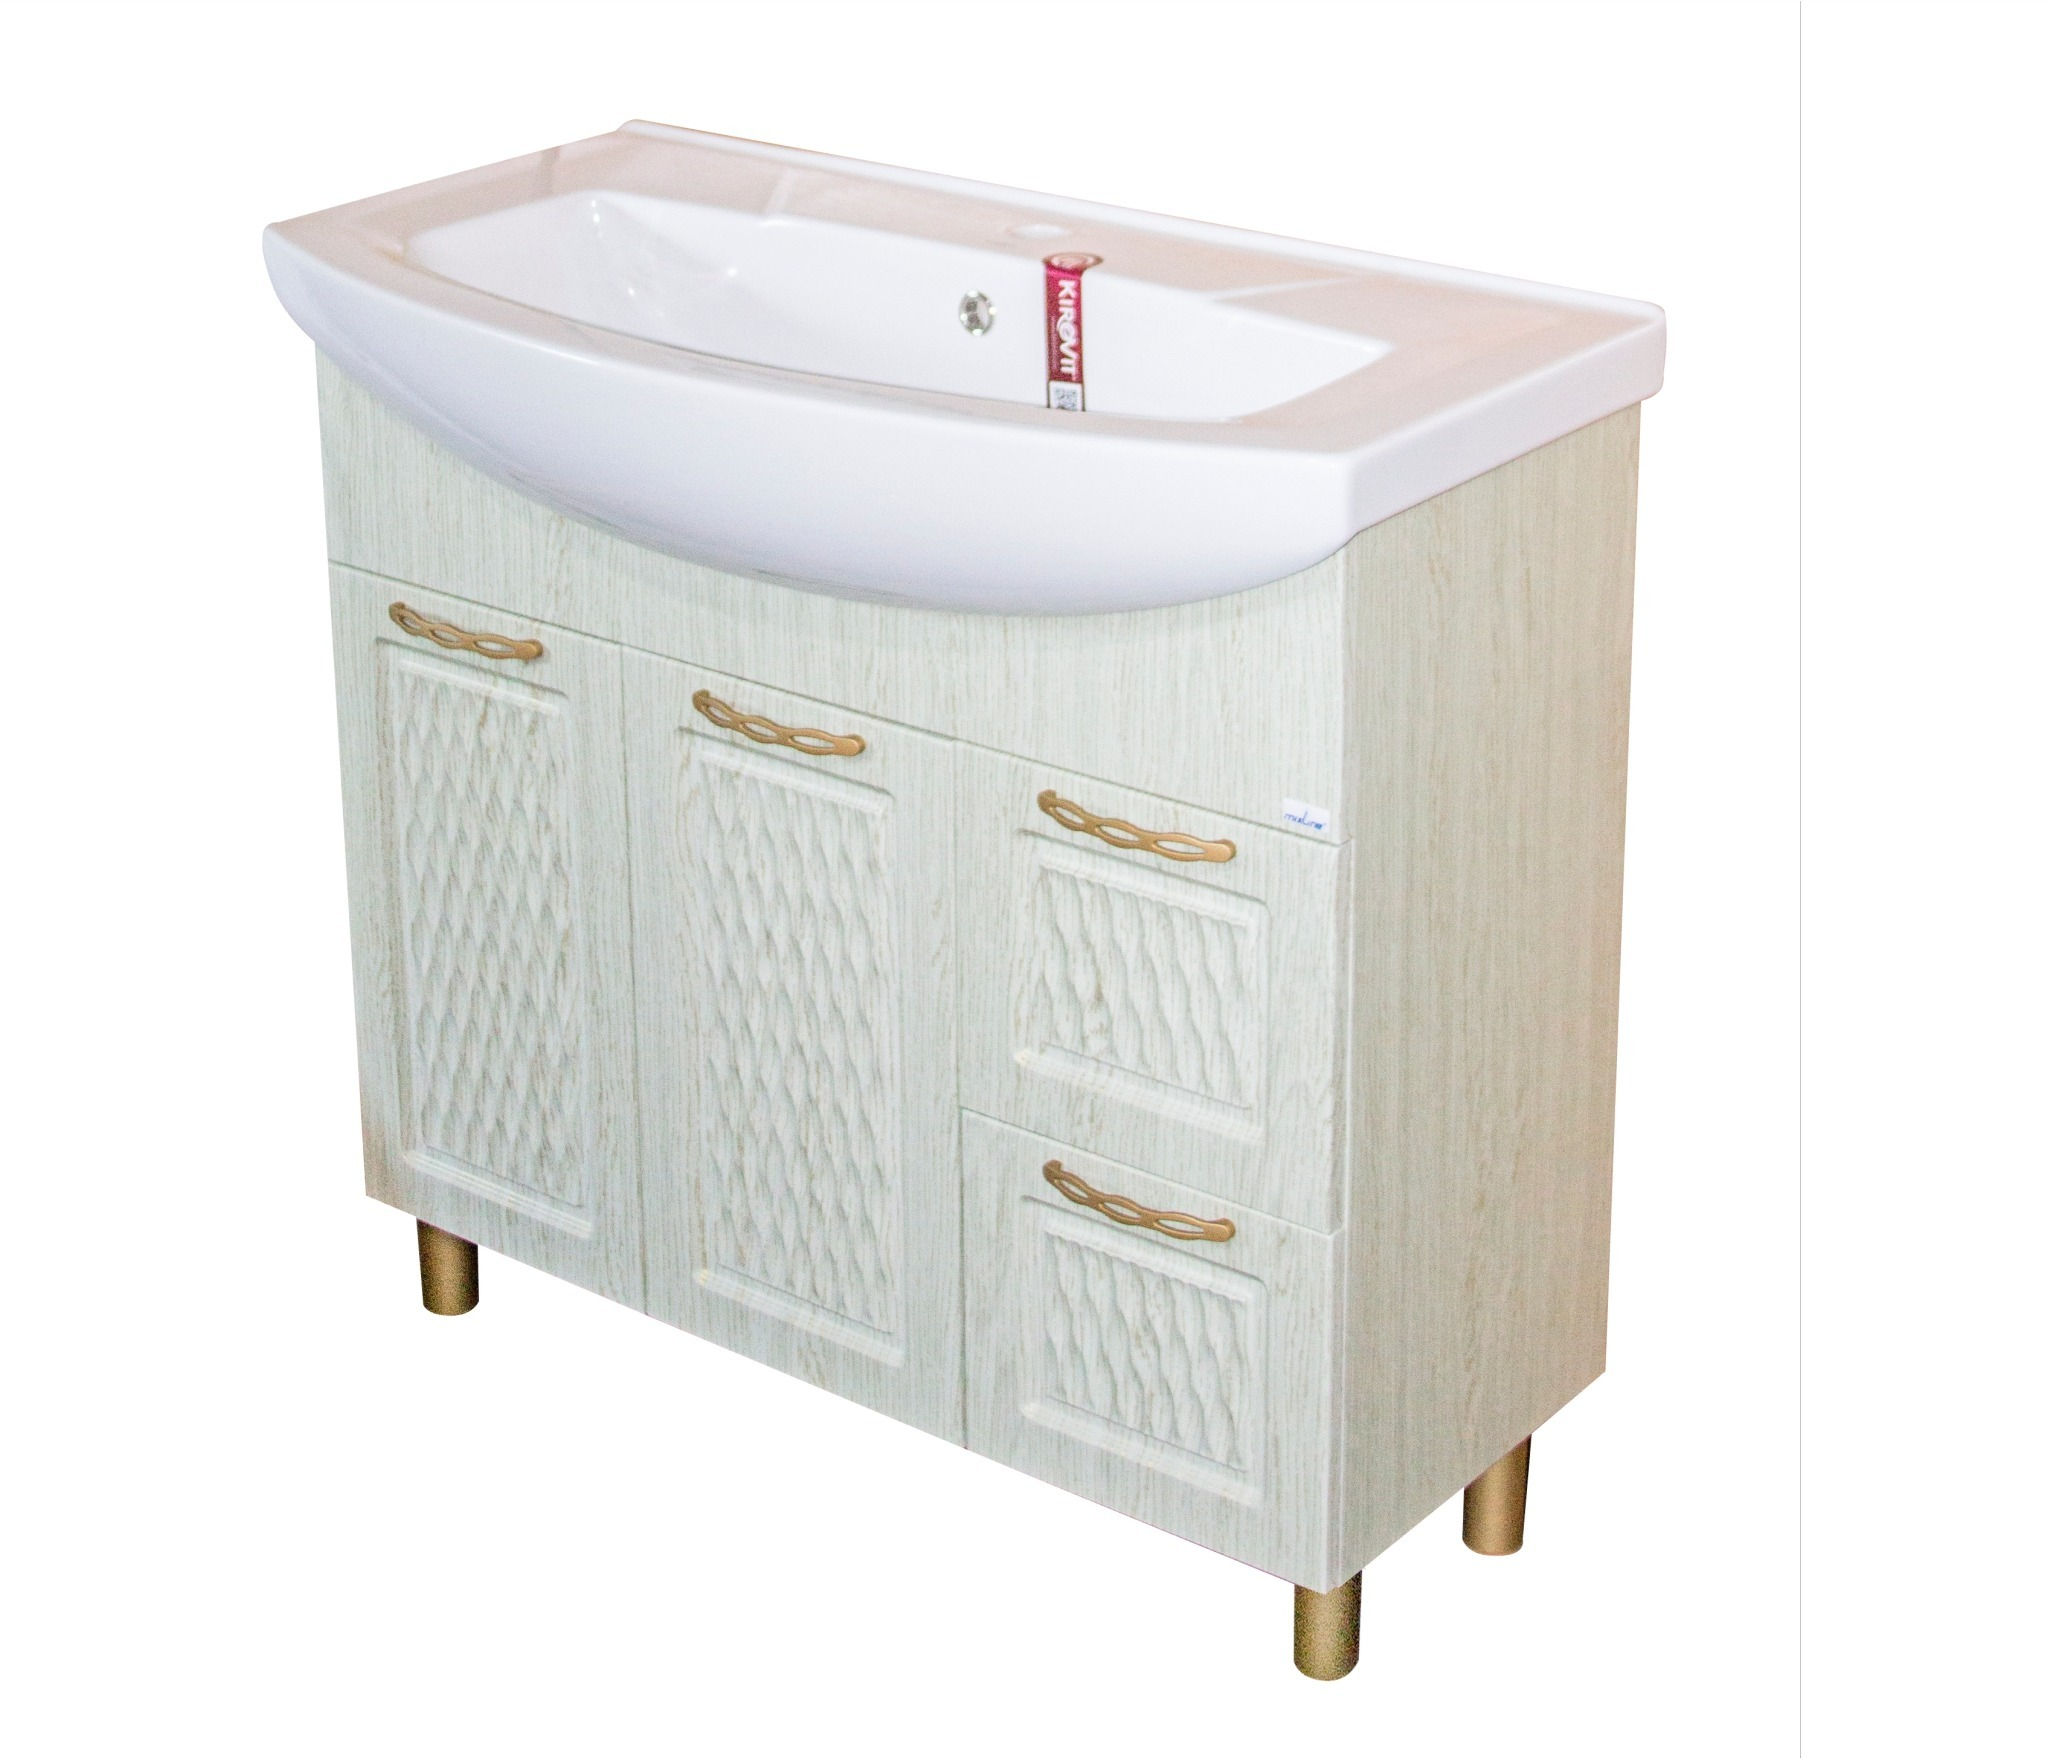 Тумба д/ванной Ладога-75 под ум.Элеганс-75 белая (ПВХ) набор мебели для ванной mixline ладога 75 белый зеркало тумба раковина